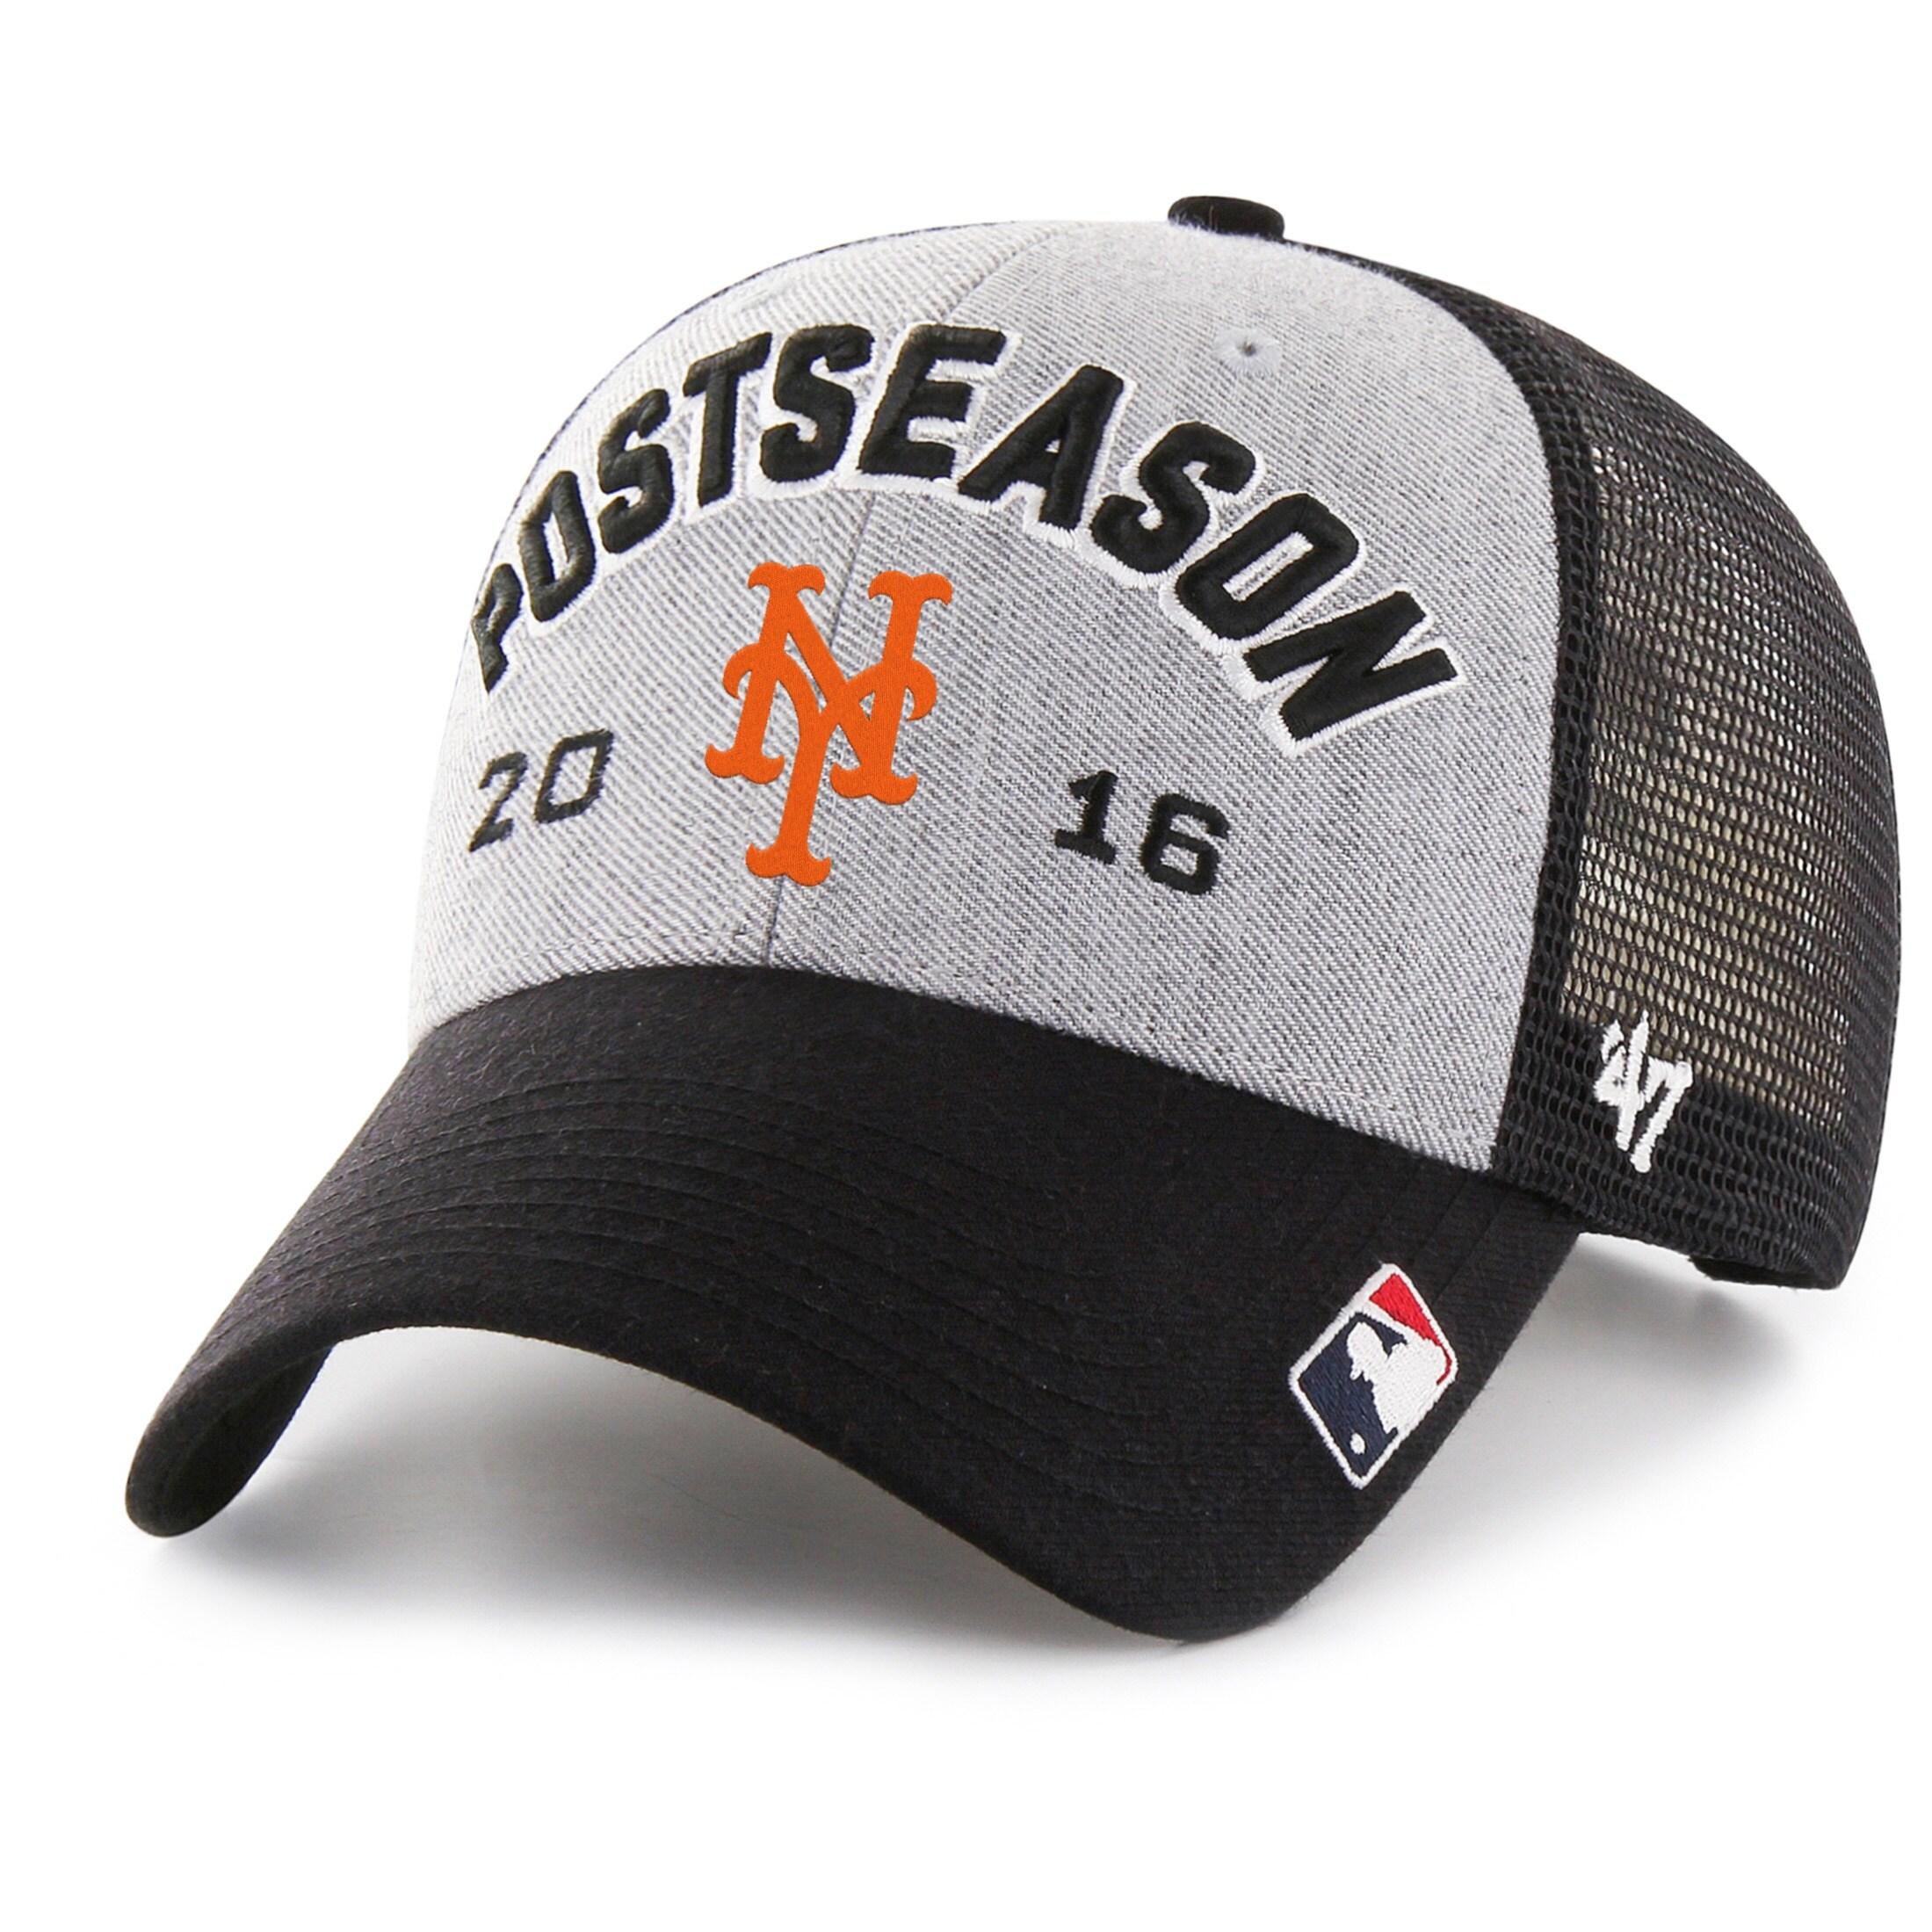 New York Mets '47 2016 Postseason Tamarac Locker Room Adjustable Hat - Gray